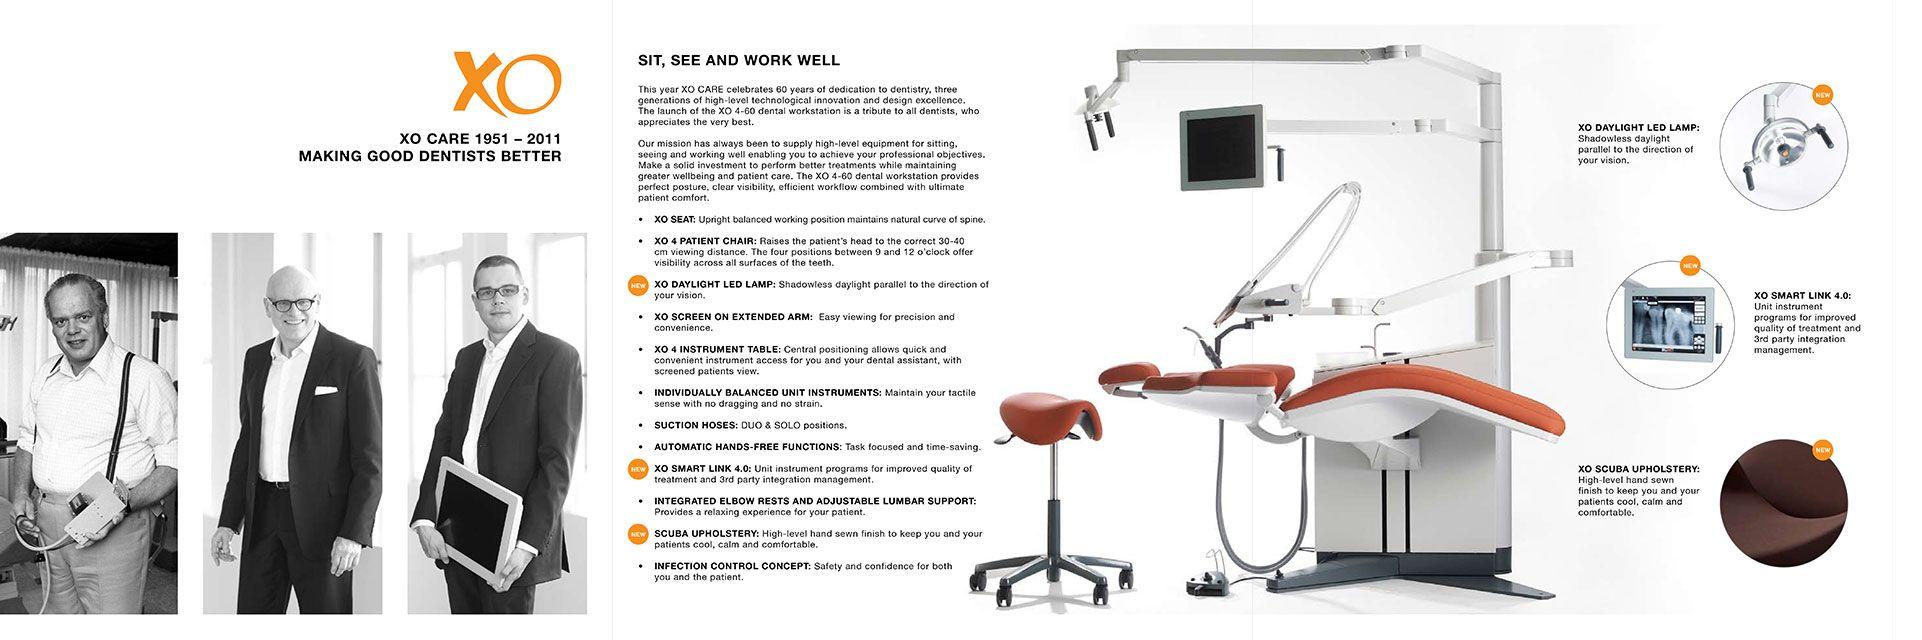 1.-XO-CARE--Dentist-Clinic-Strategy_KJAER-GLOBAL